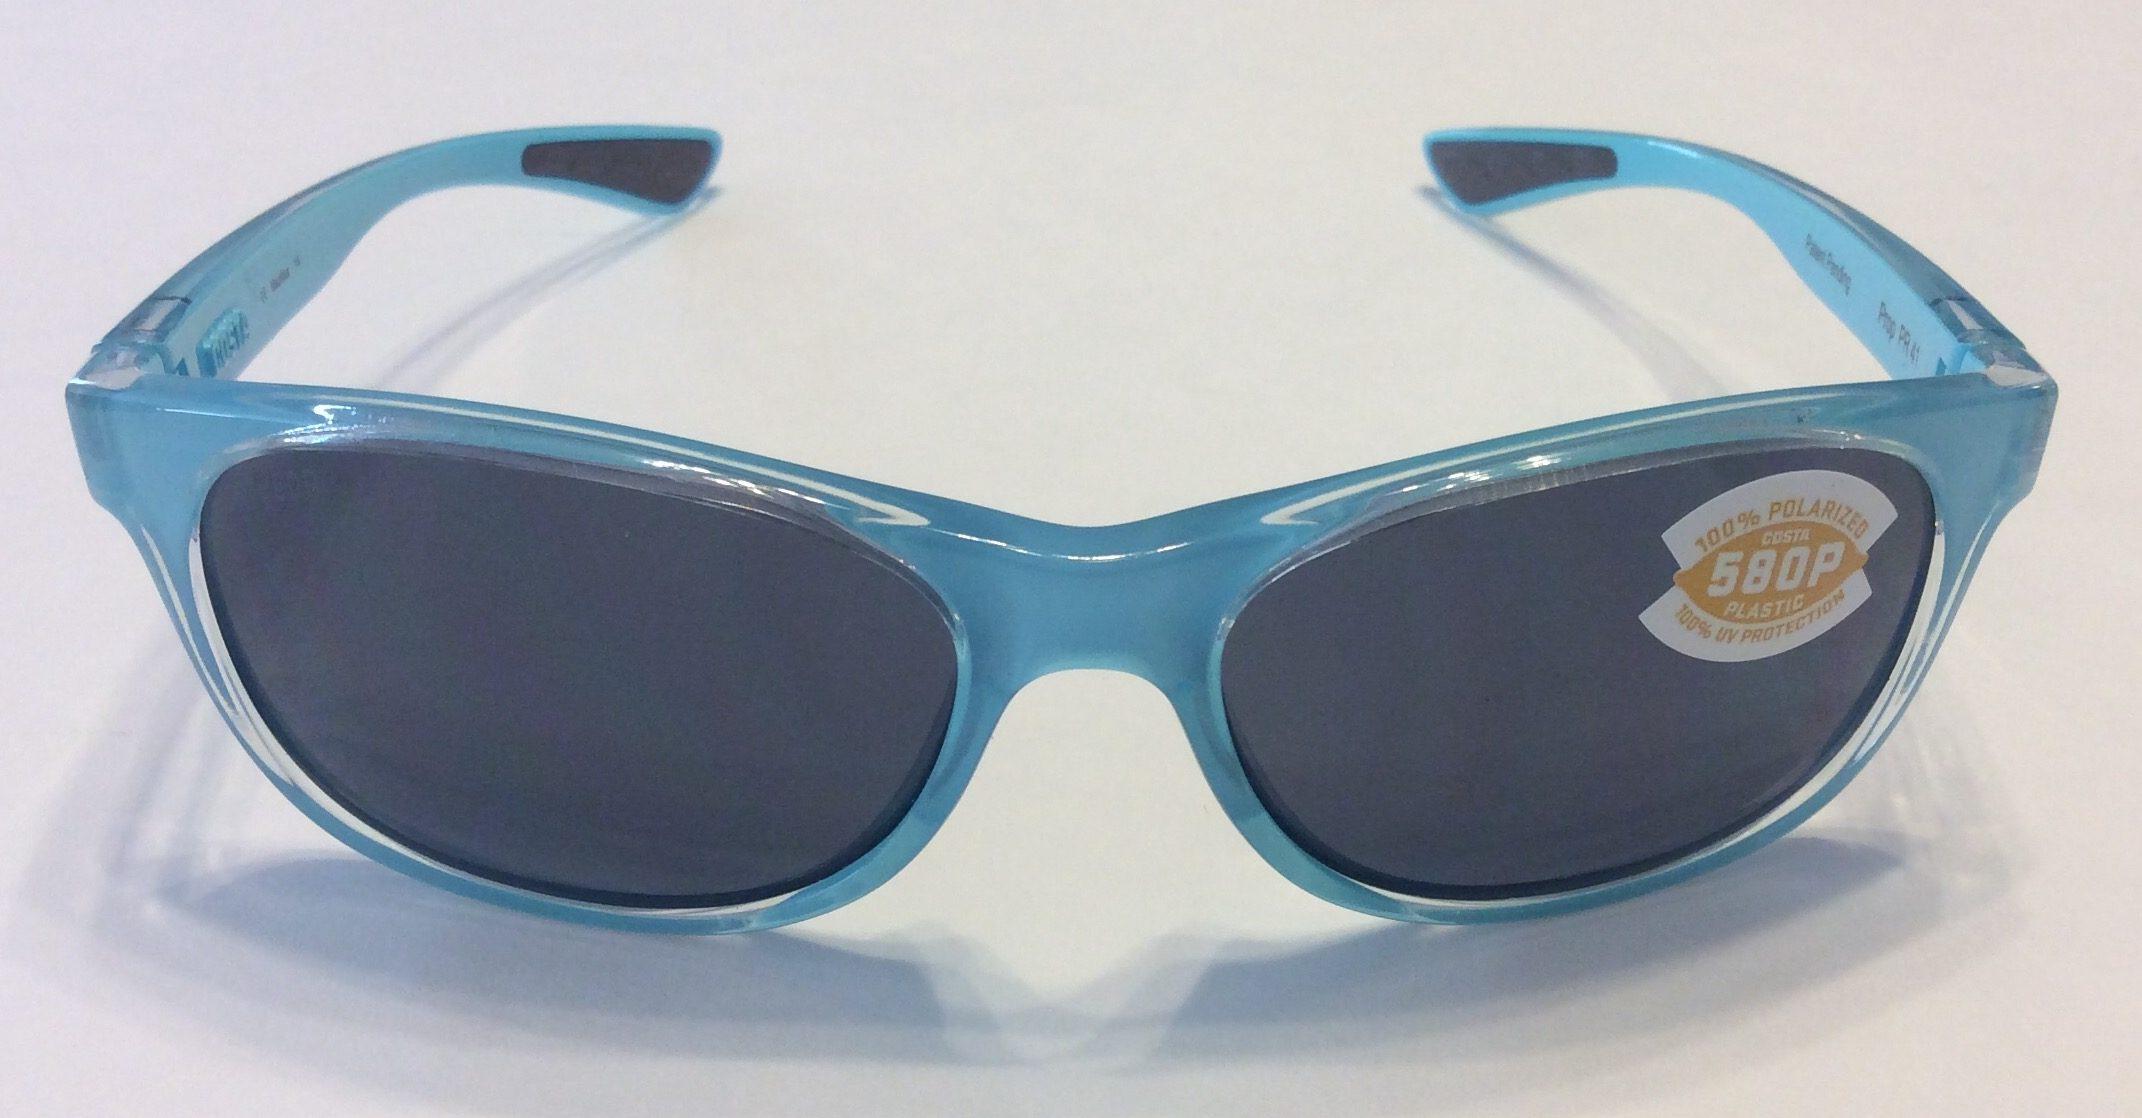 Costa del mar prop ocean blue polarized gray 580p - Ocean sunglasses ...